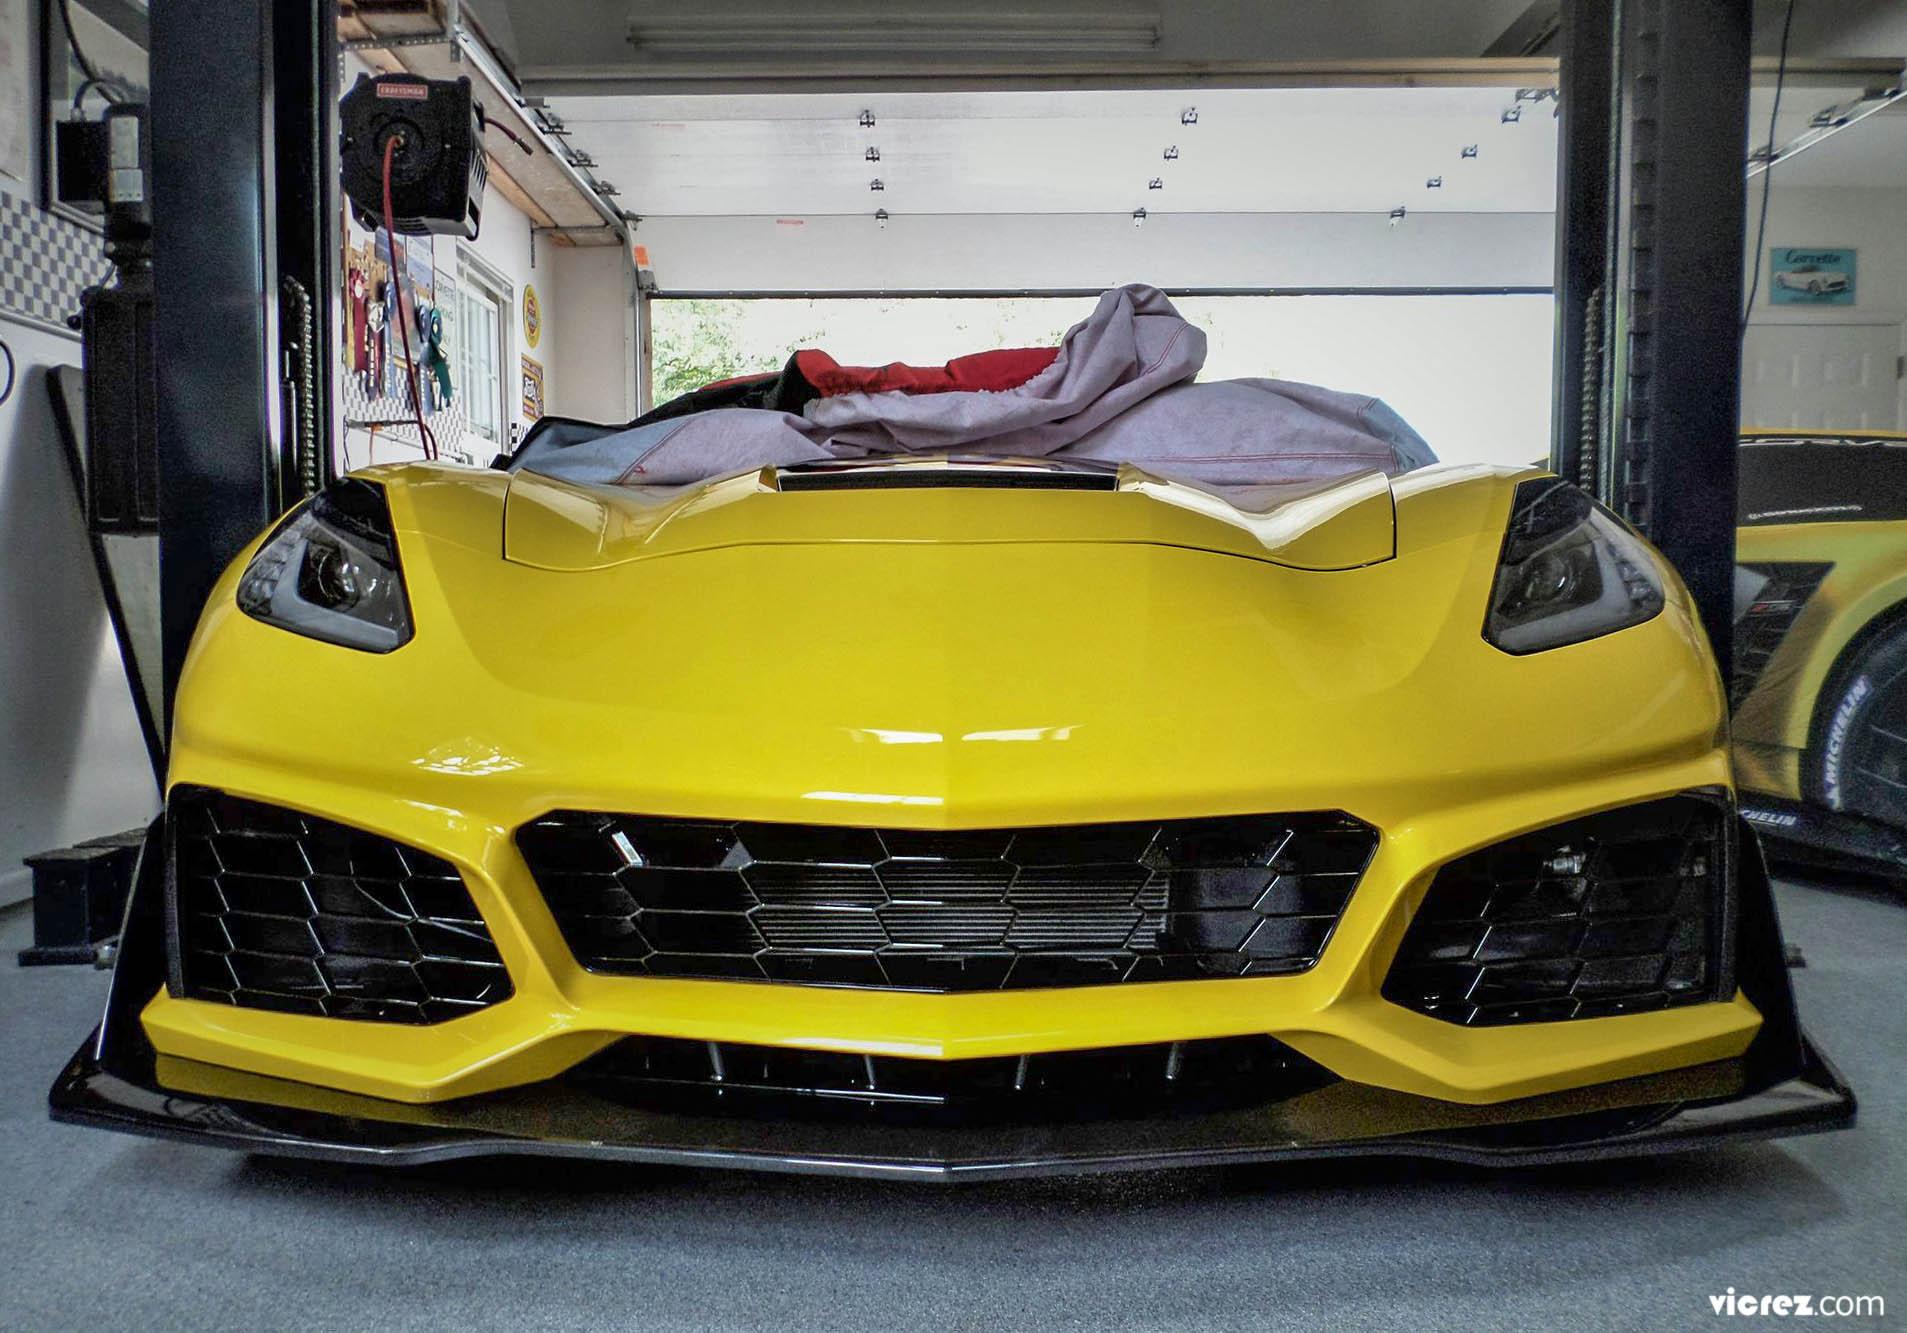 Vicrez VZR1 Polyurethane Front Bumper vz101478 | Chevrolet Corvette C7 2014-2019